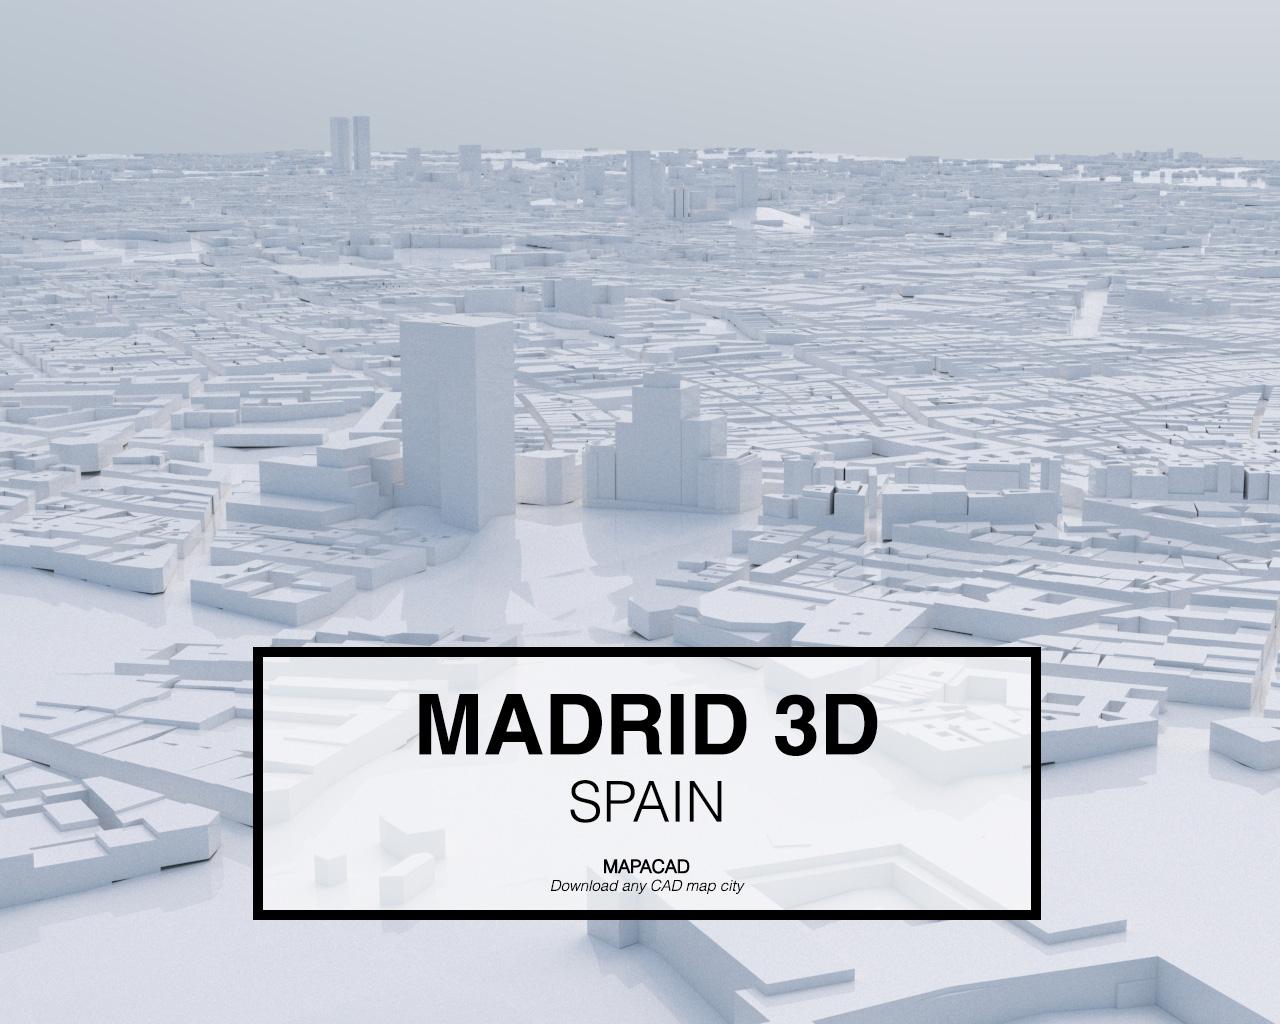 Madrid 3D